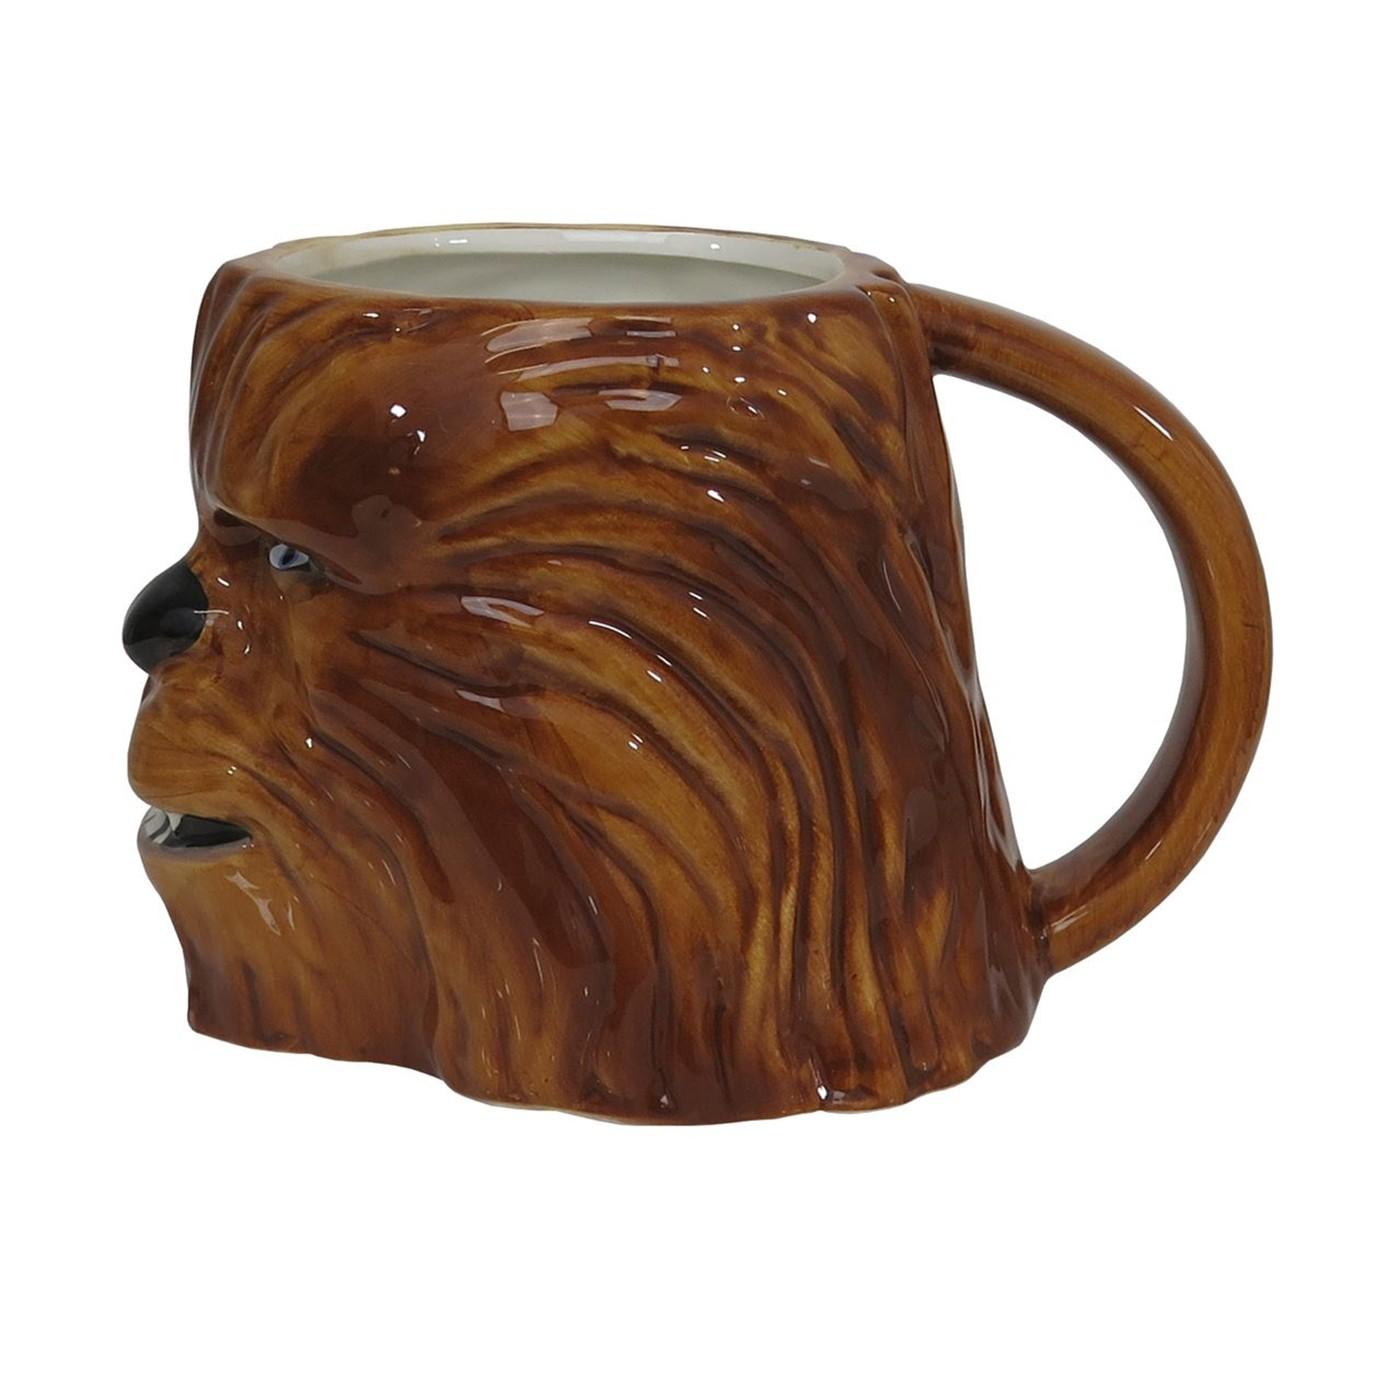 Star Wars Chewbacca Sculpted 11oz Ceramic Mug